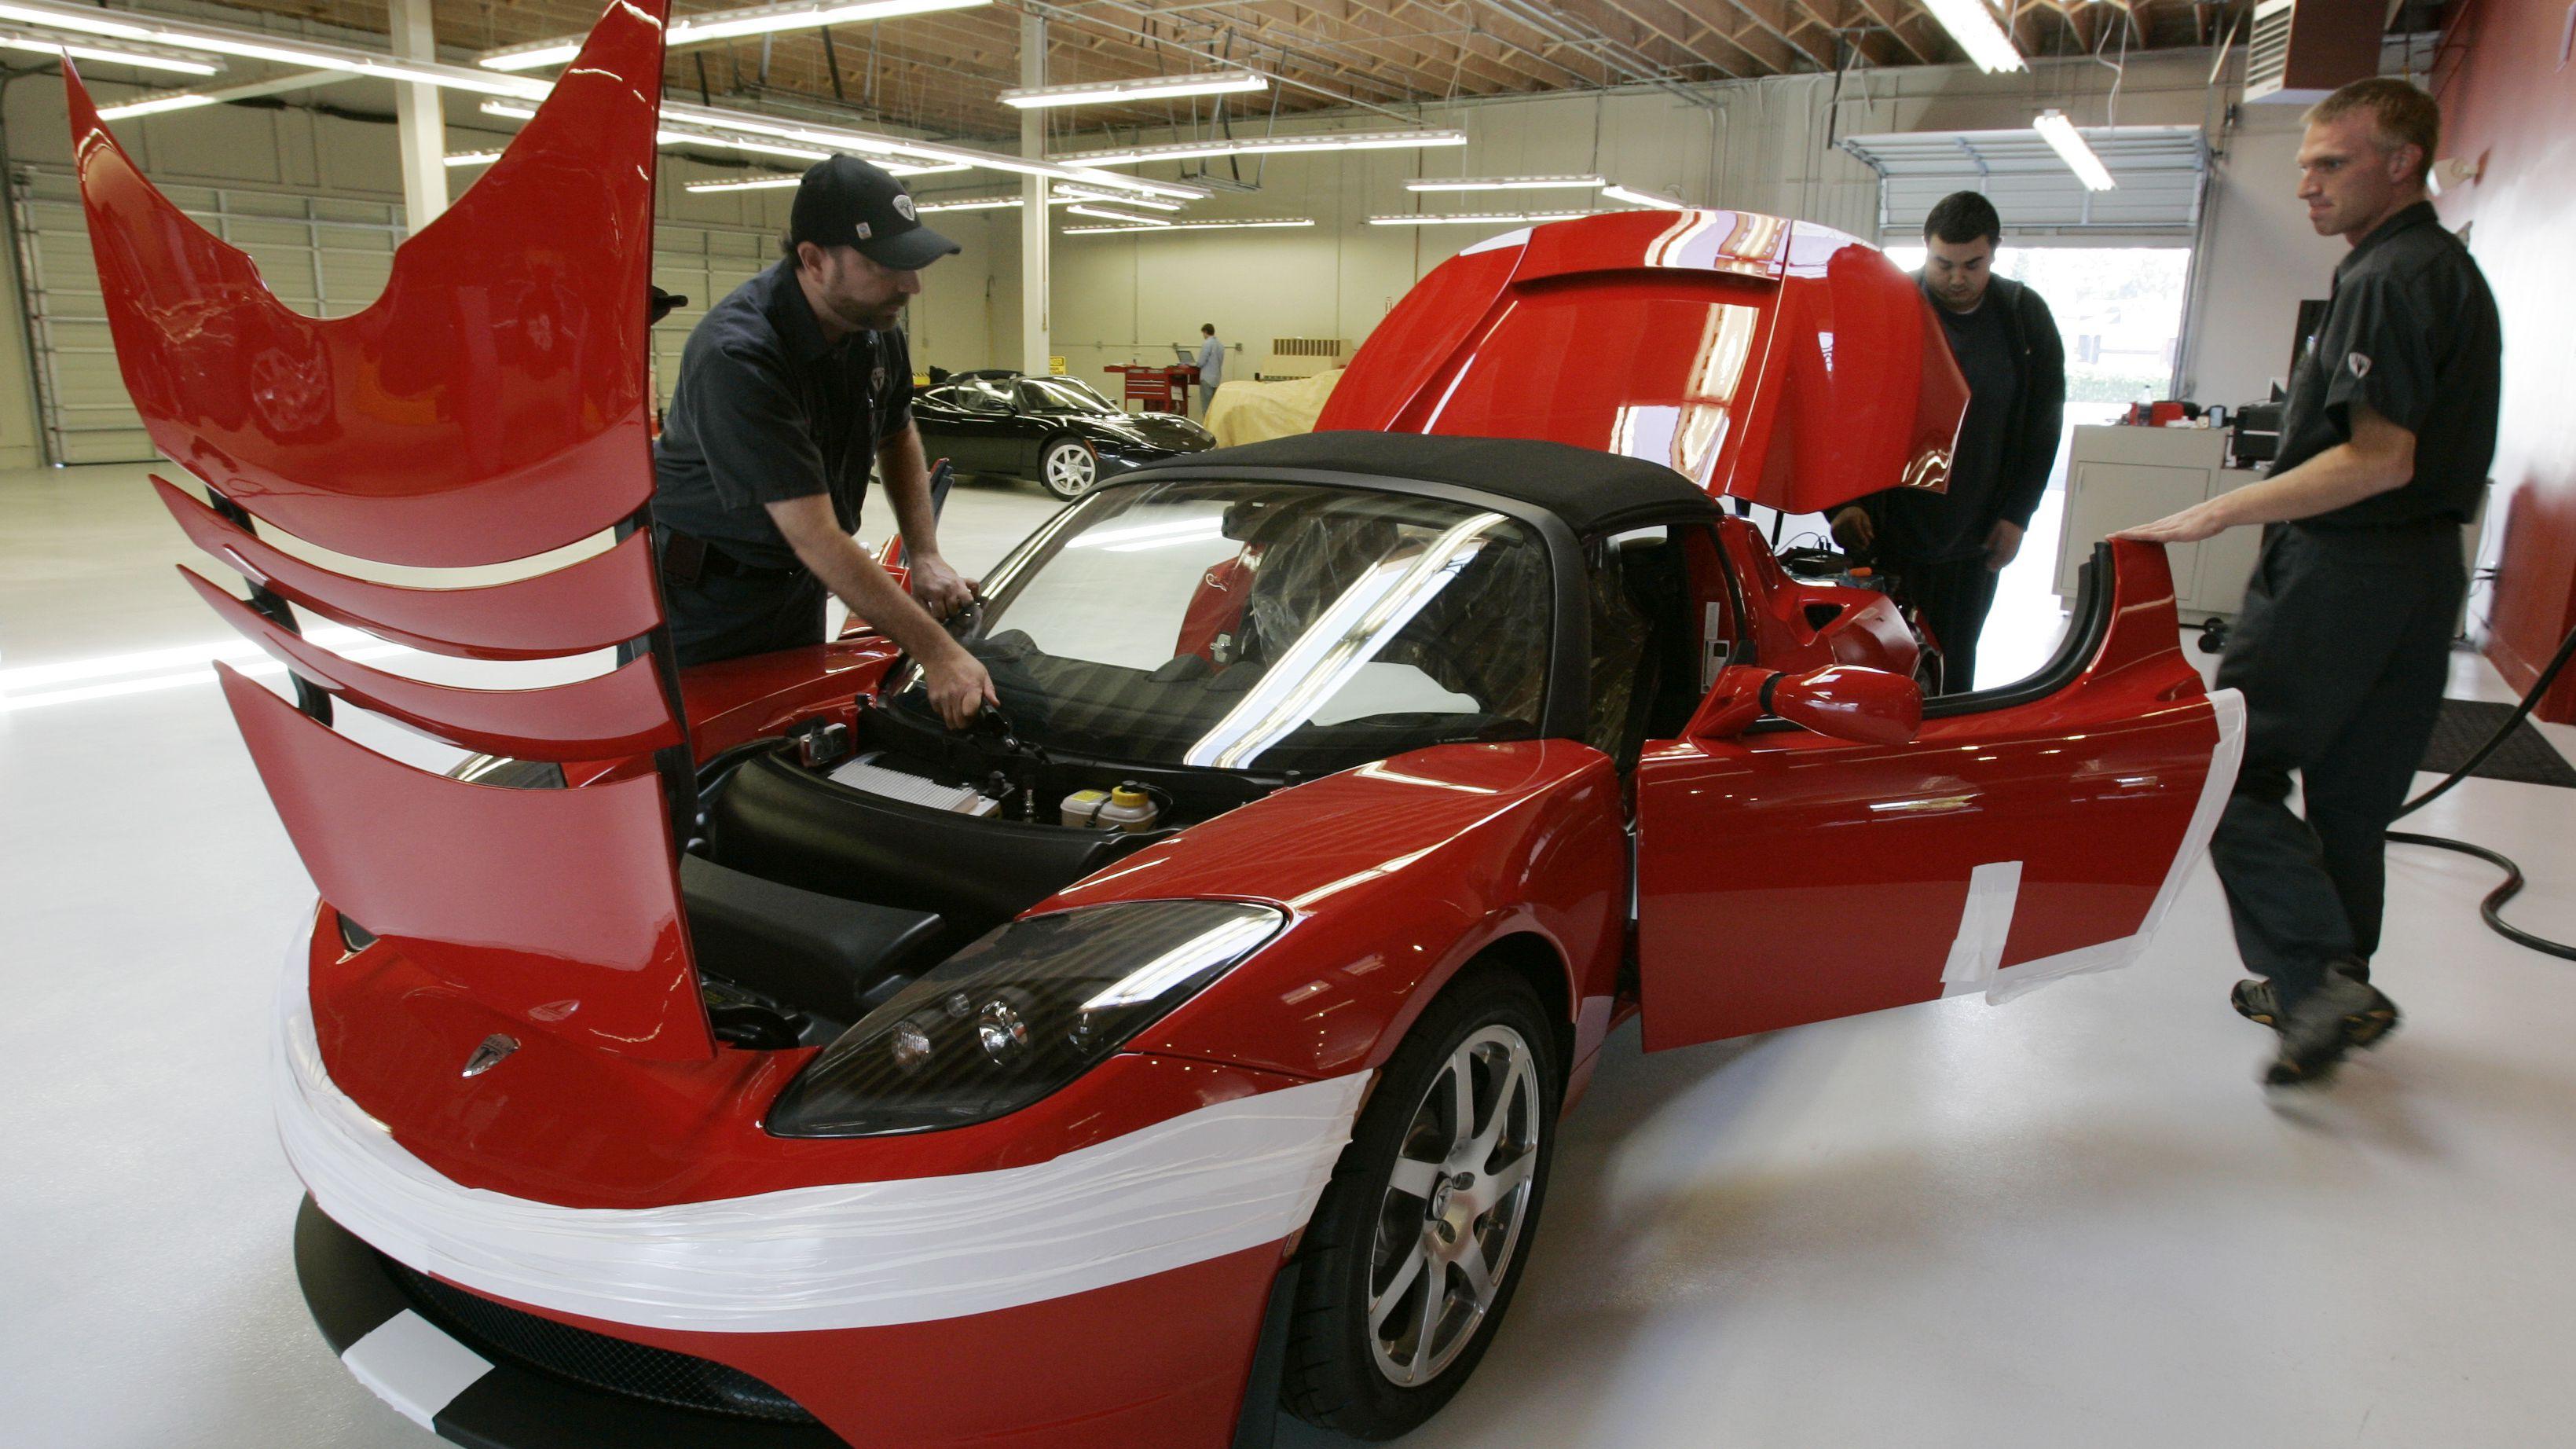 Car mechanic hard at work